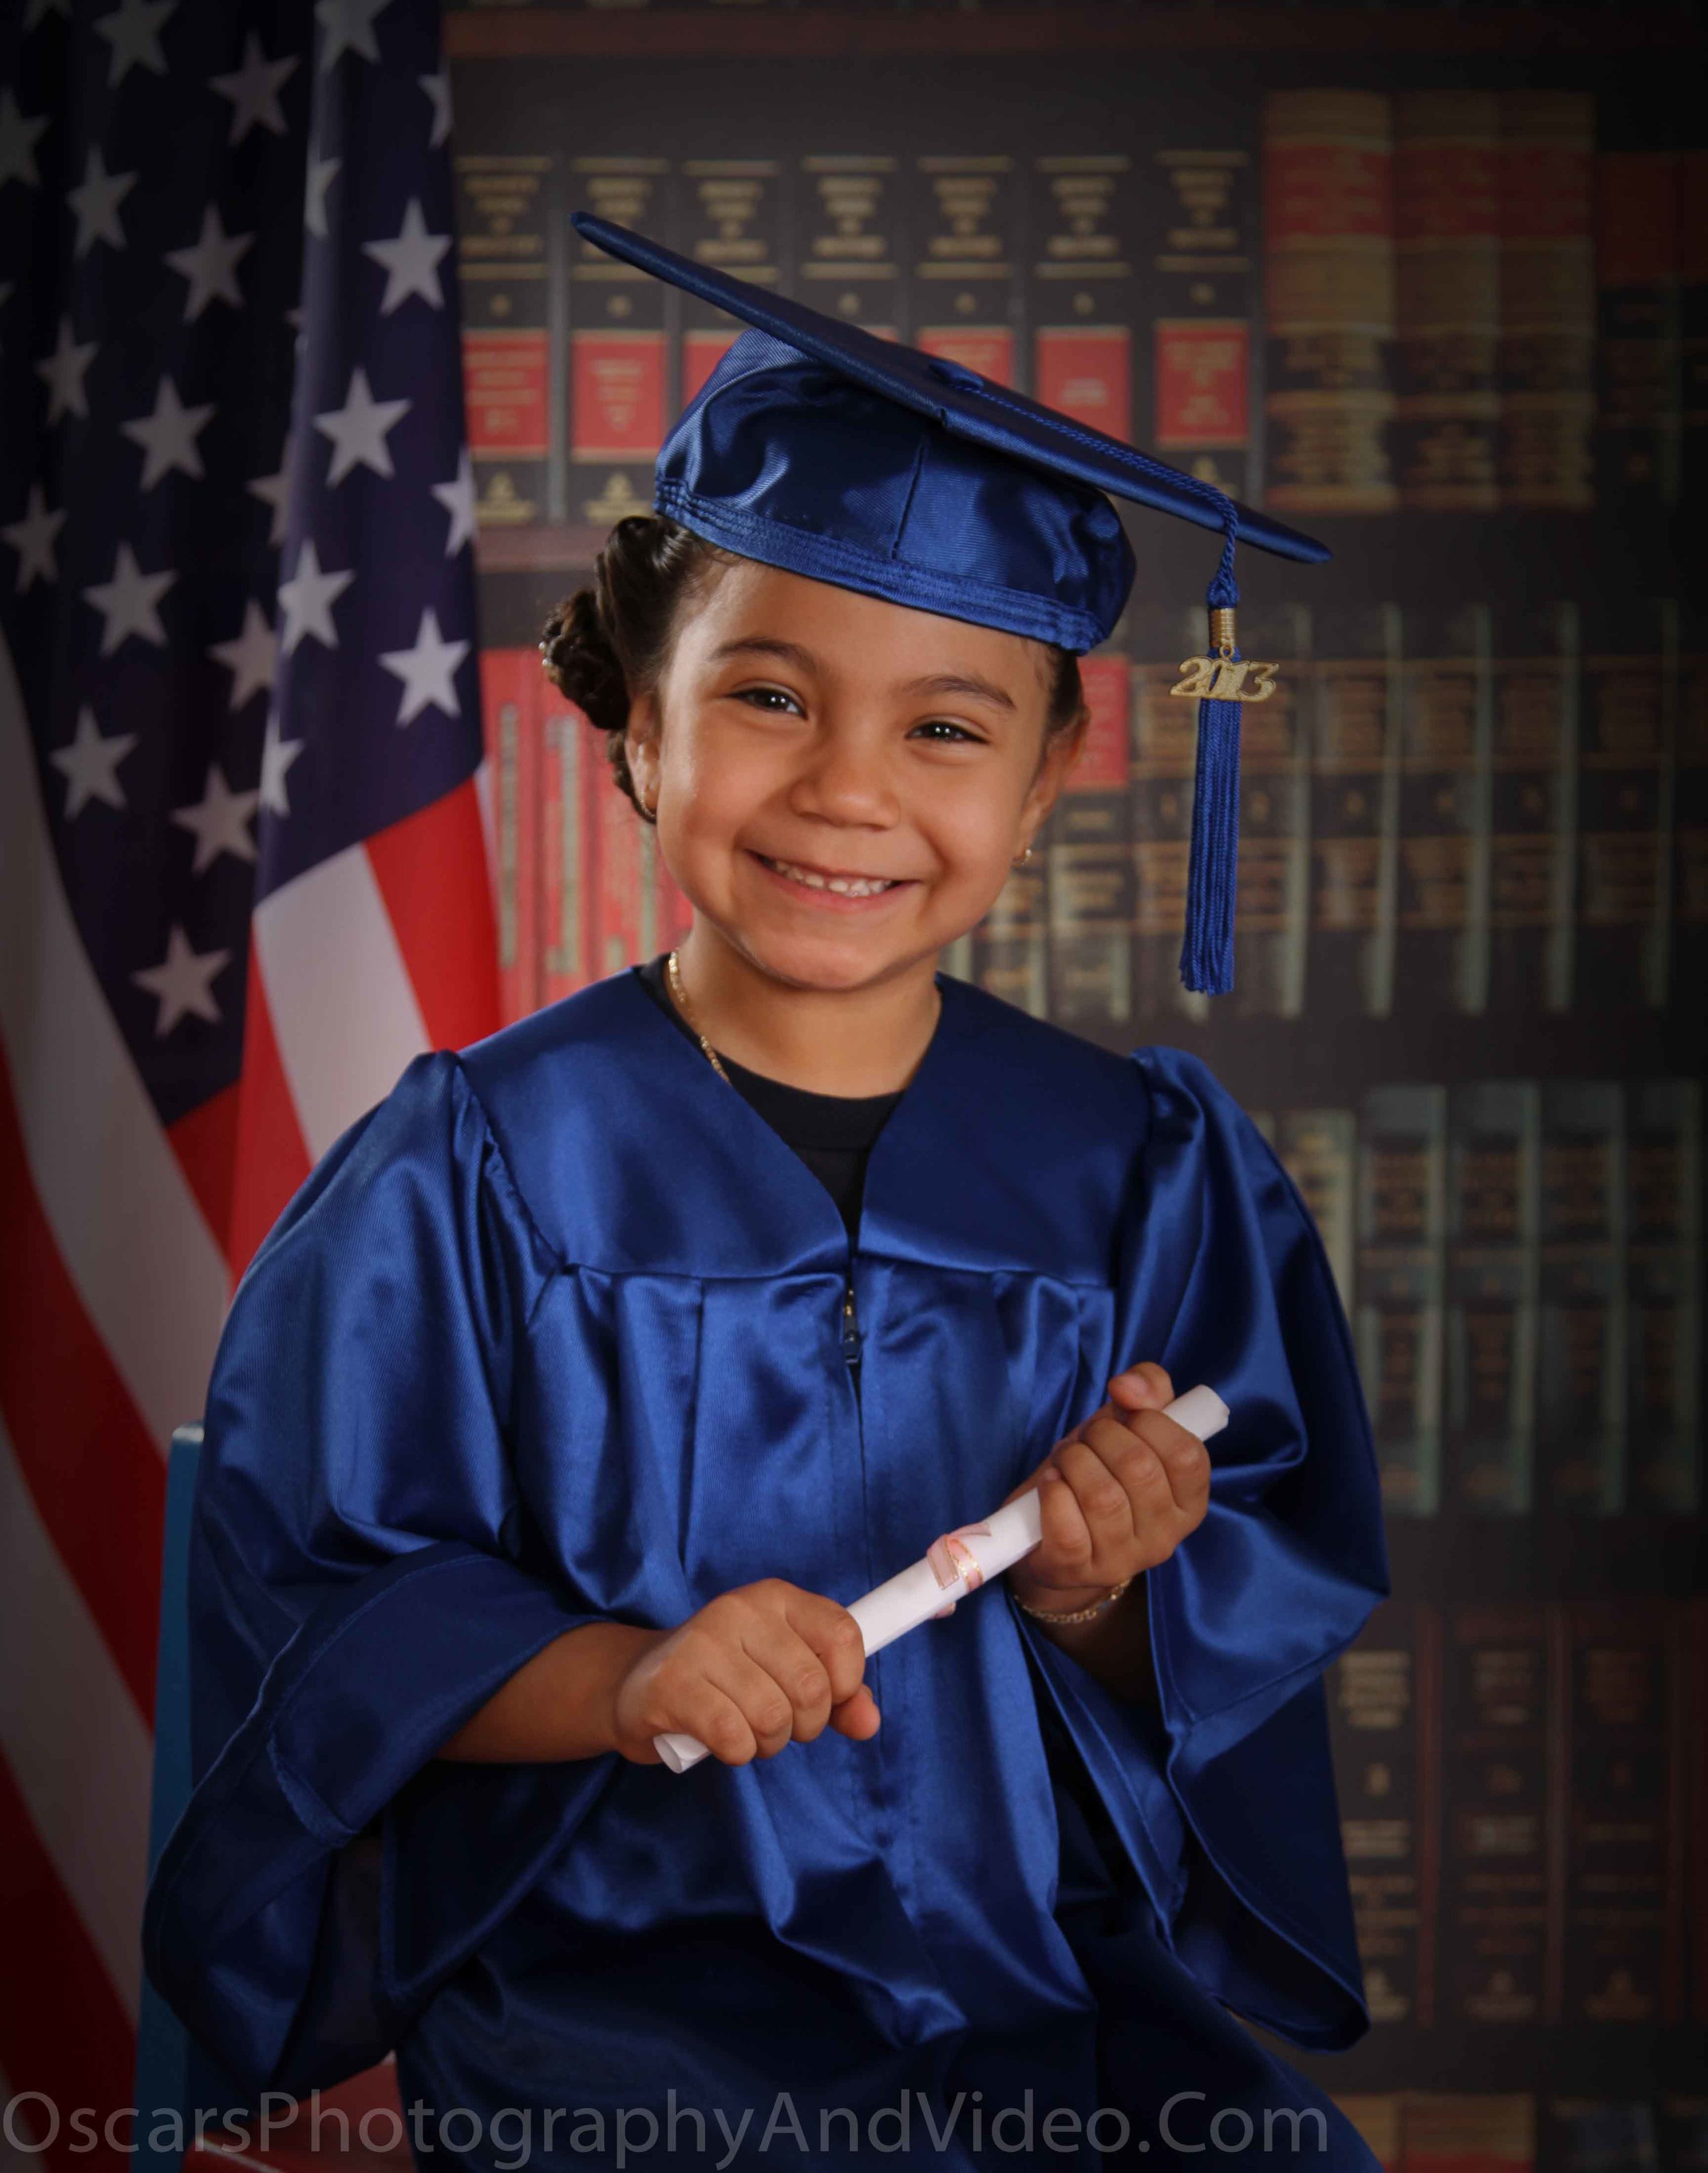 Mary Law Private School Graduation 2013 Oscars Photography & Video3.jpg